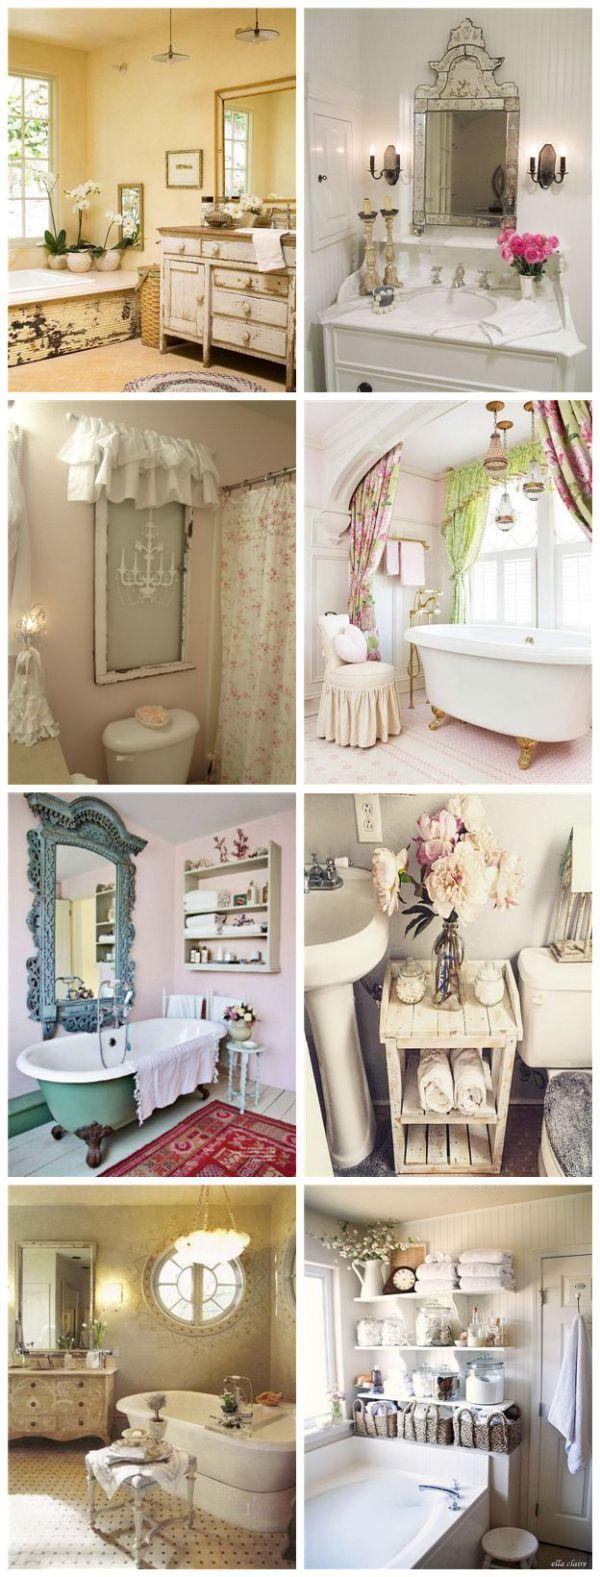 25 awesome shabby chic bathroom ideas shabby chic for Badezimmer ideen shabby